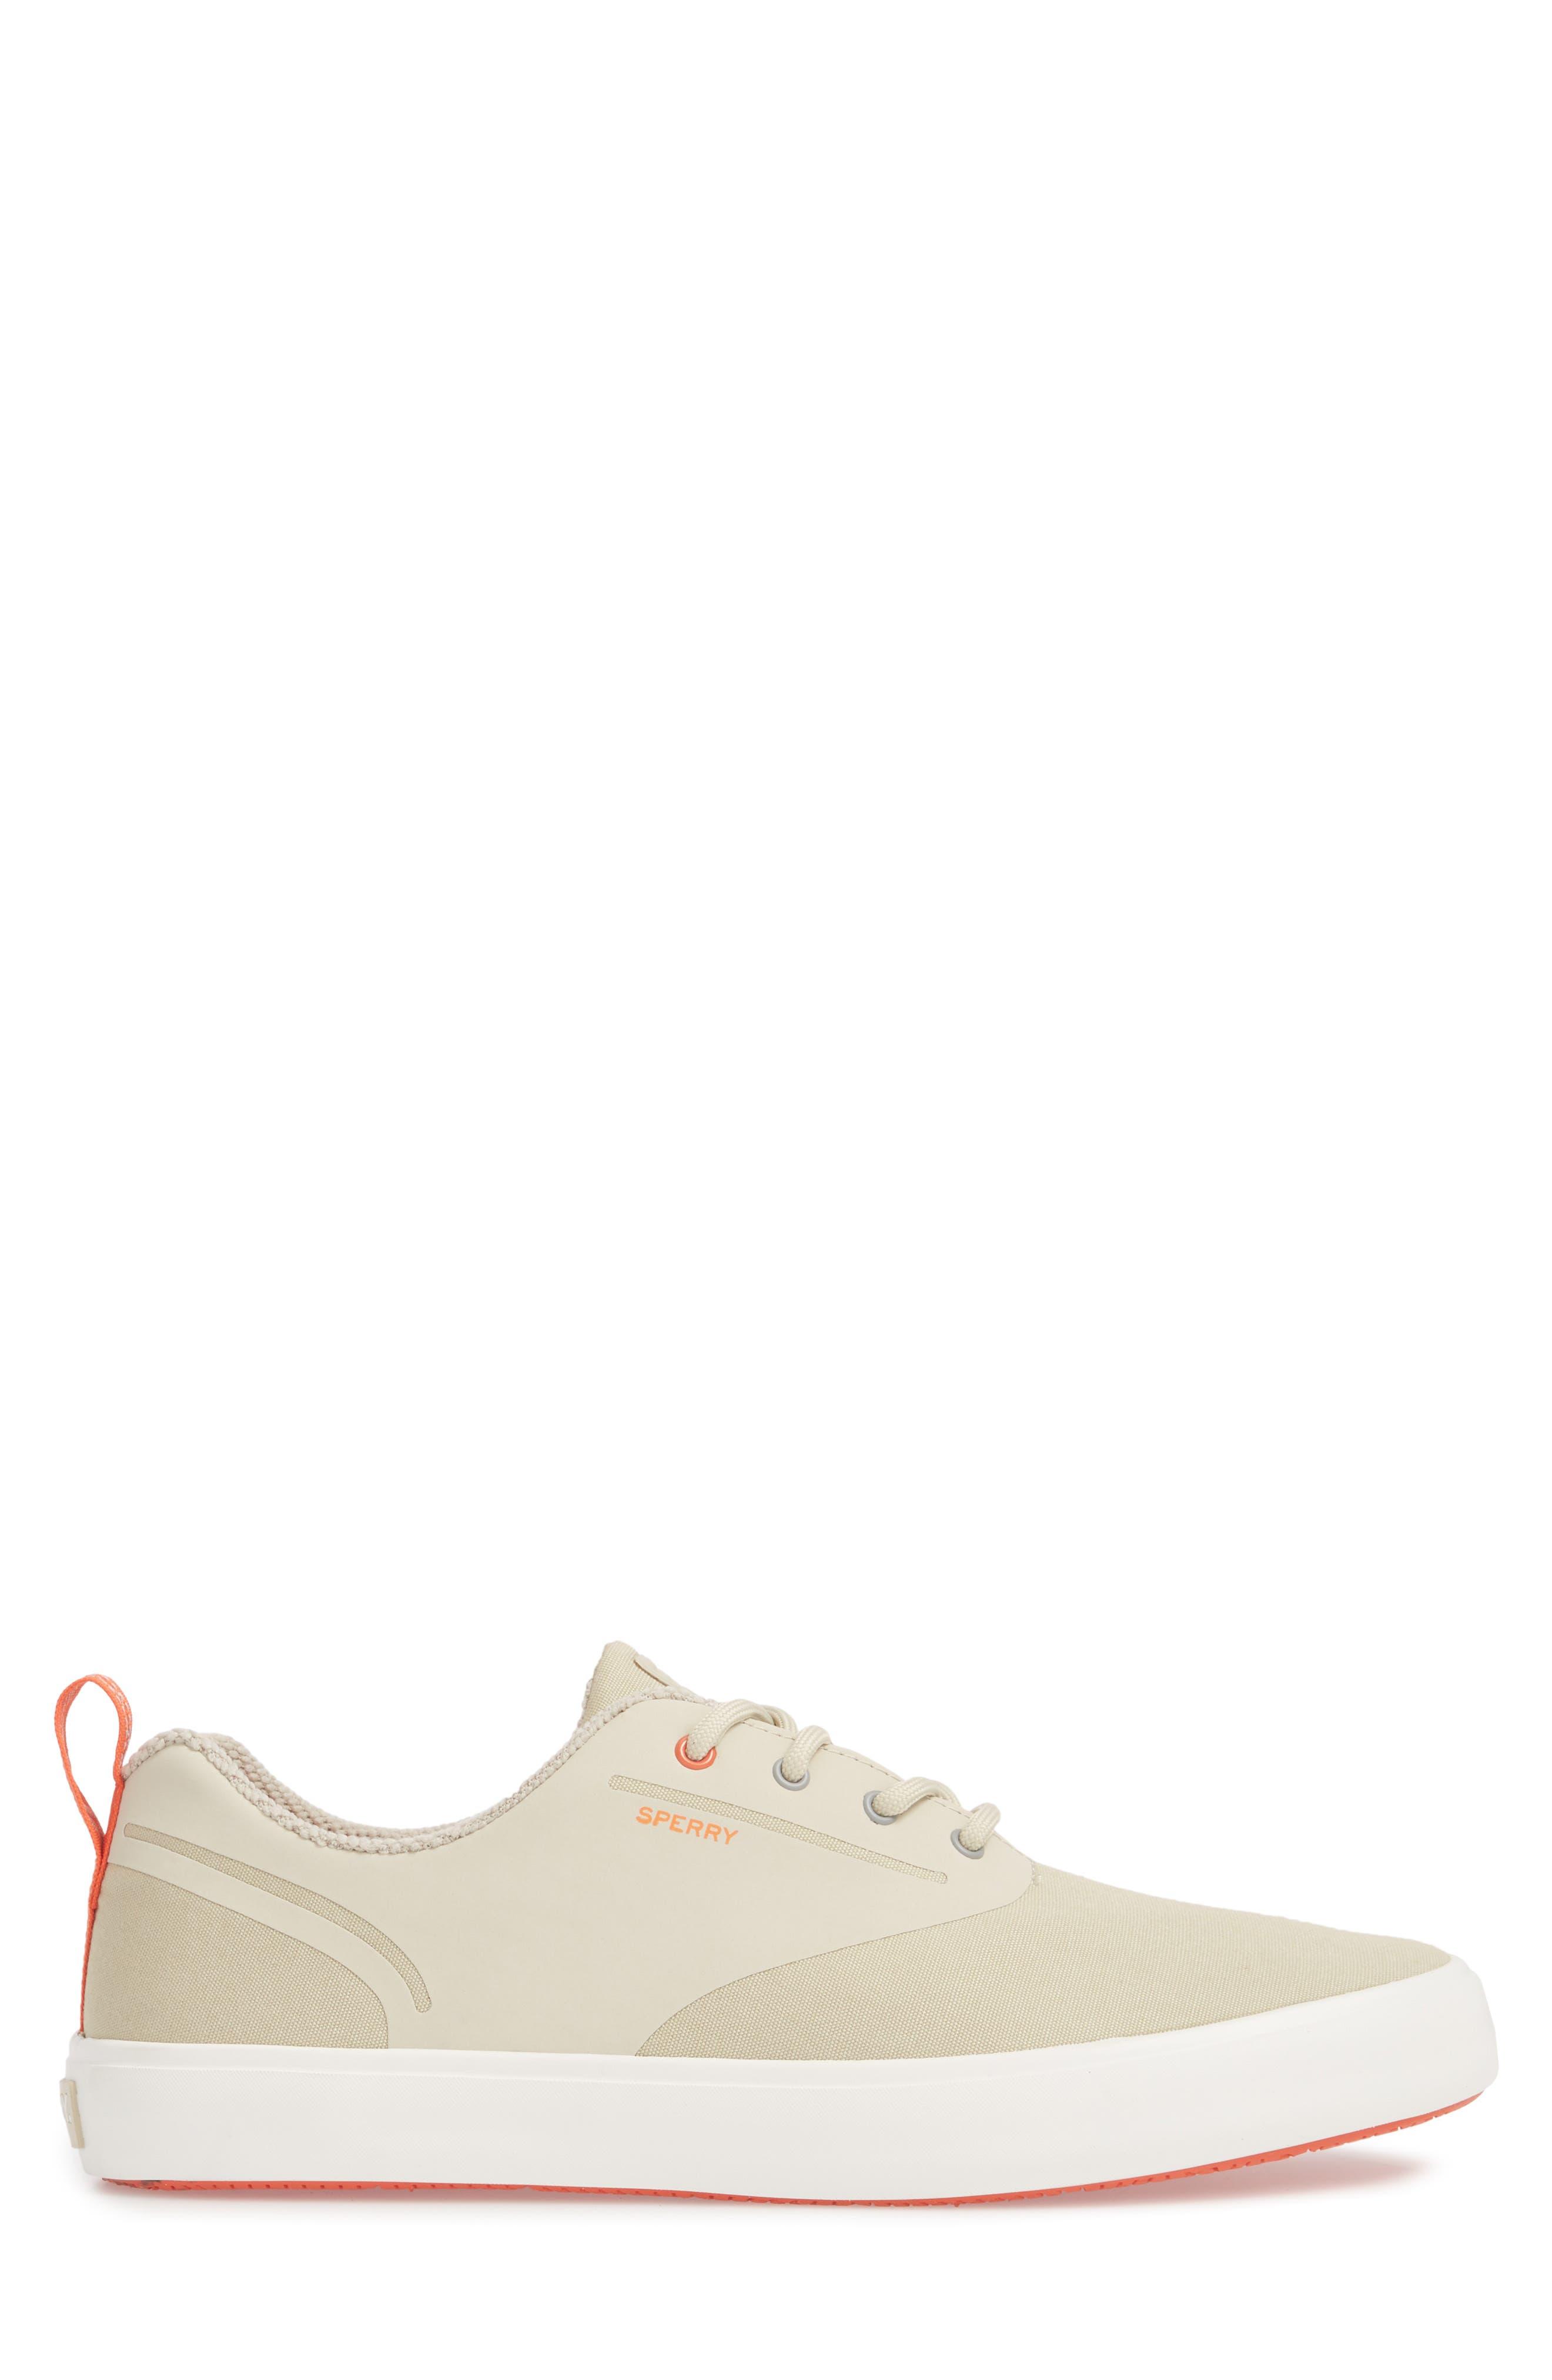 Flex Deck CVO Sneaker,                             Alternate thumbnail 3, color,                             BEIGE